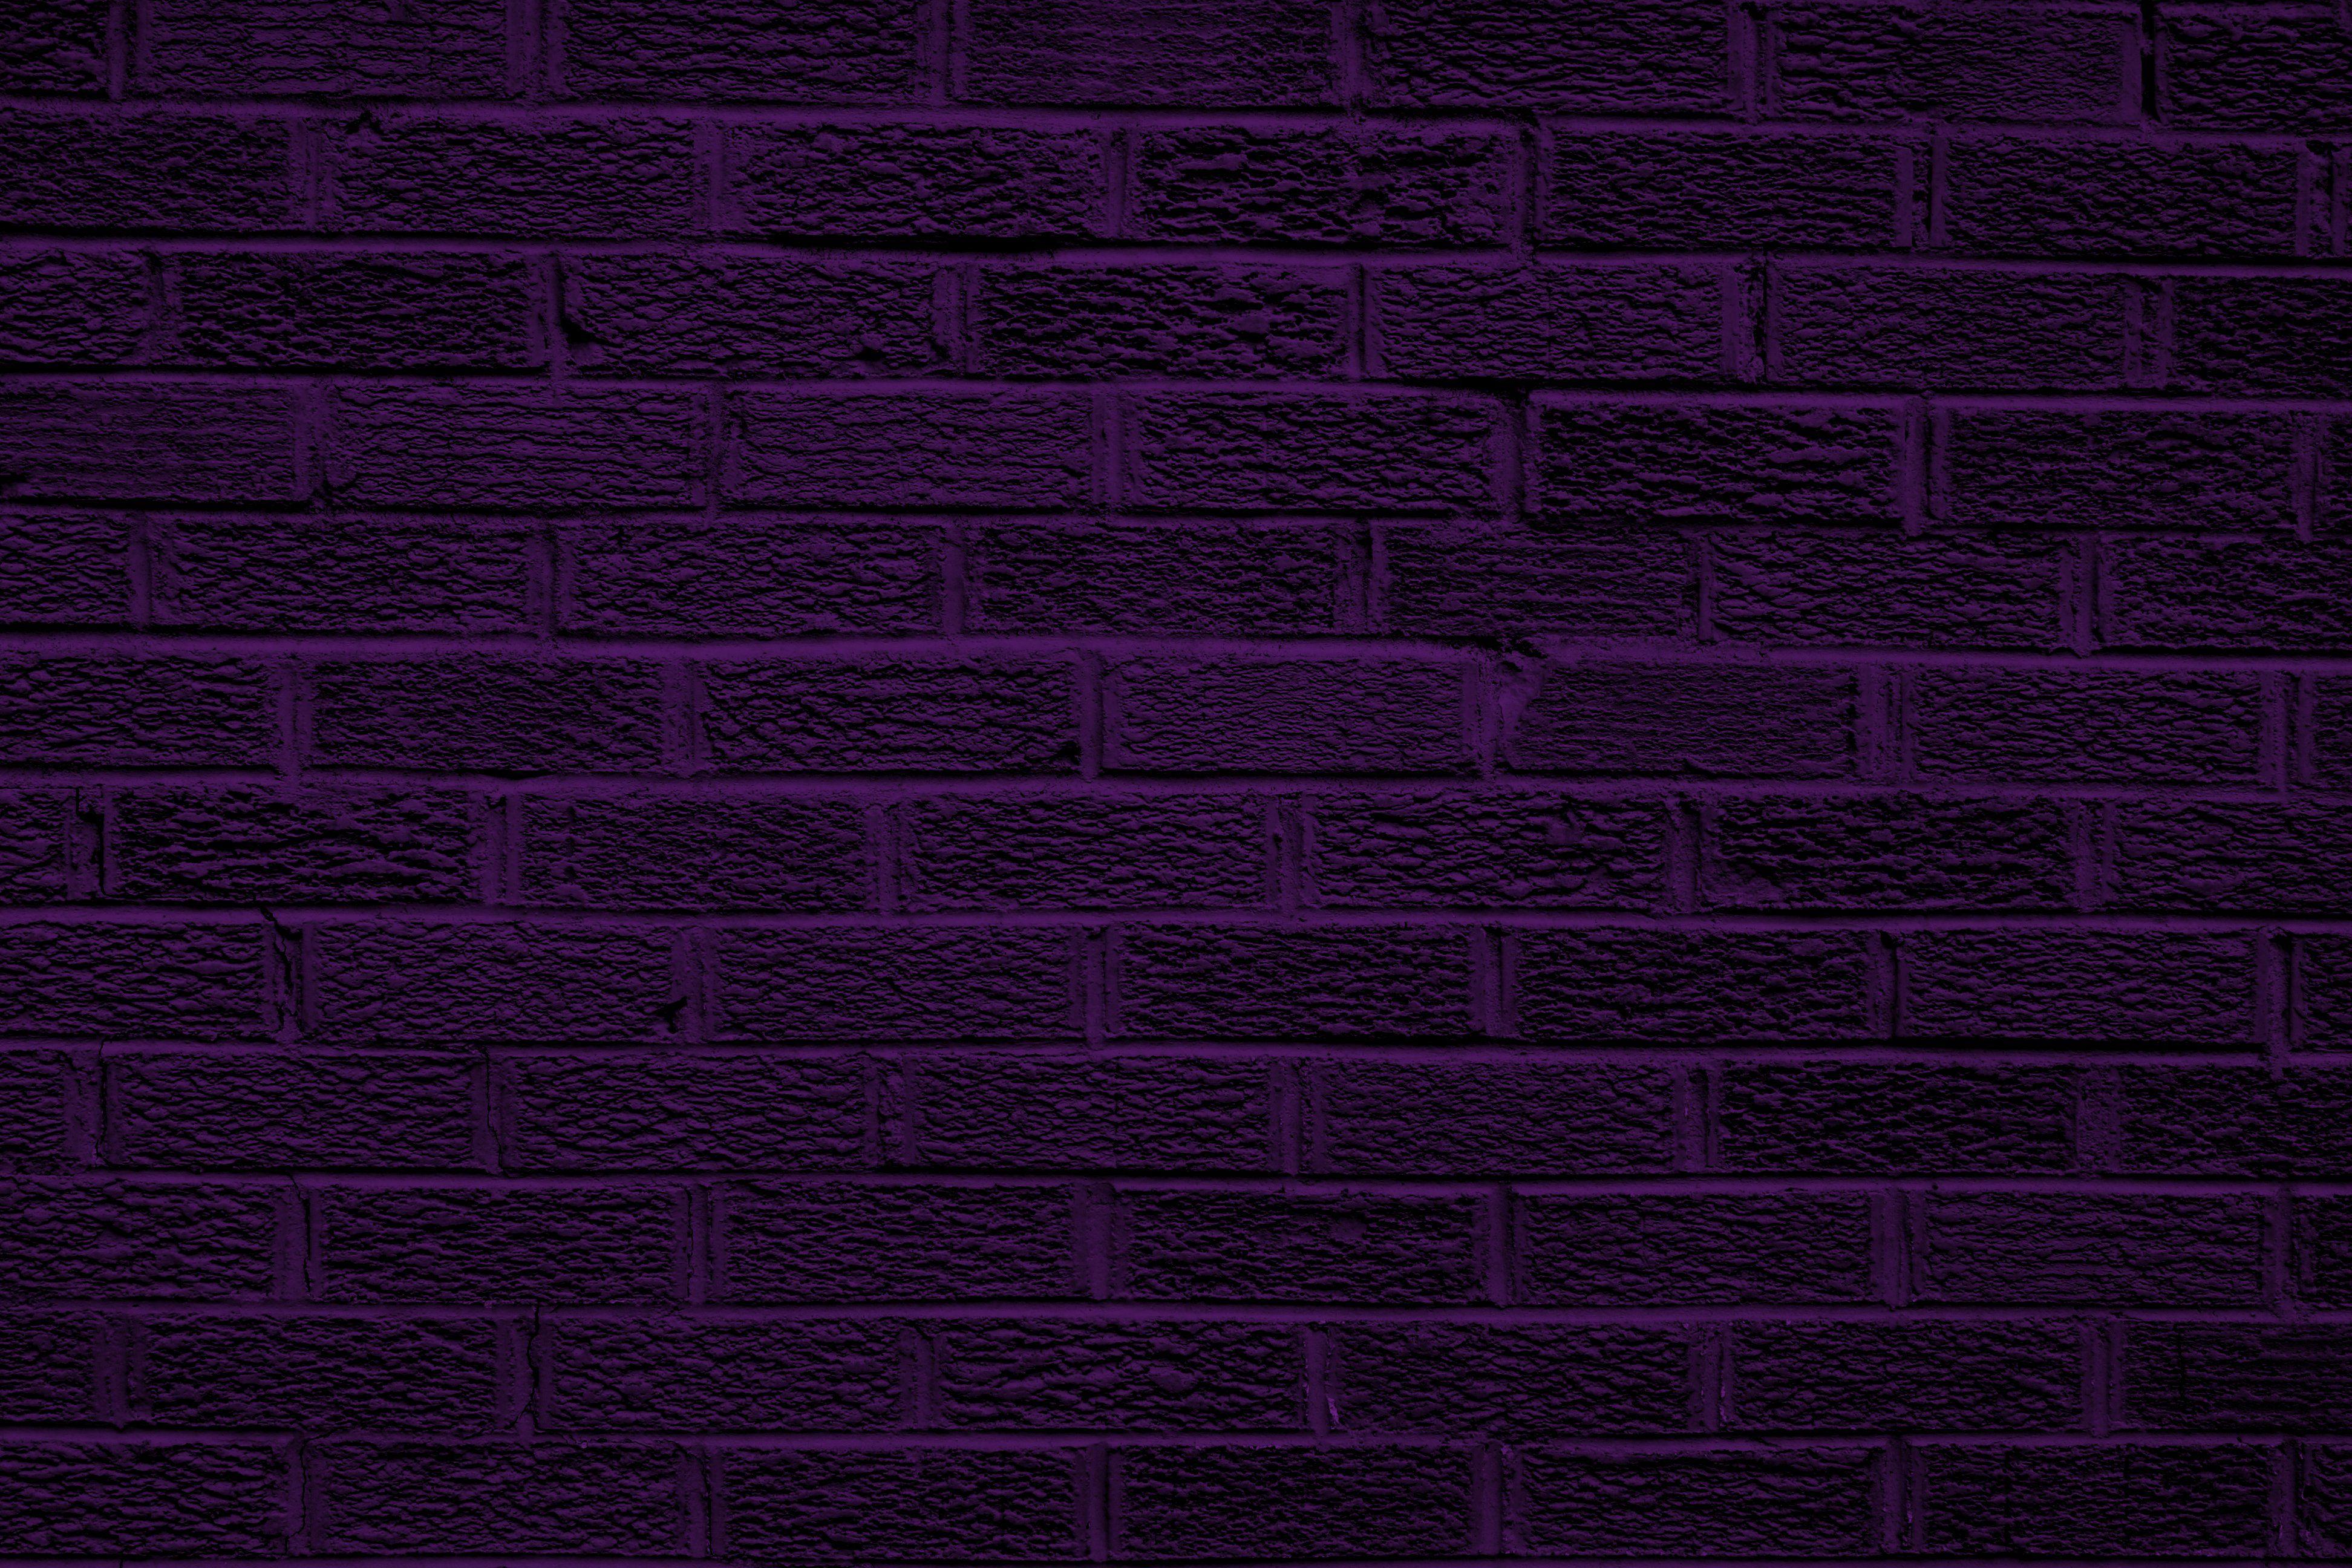 Dark Purple Backgrounds Dark Purple Brick Wall Texture